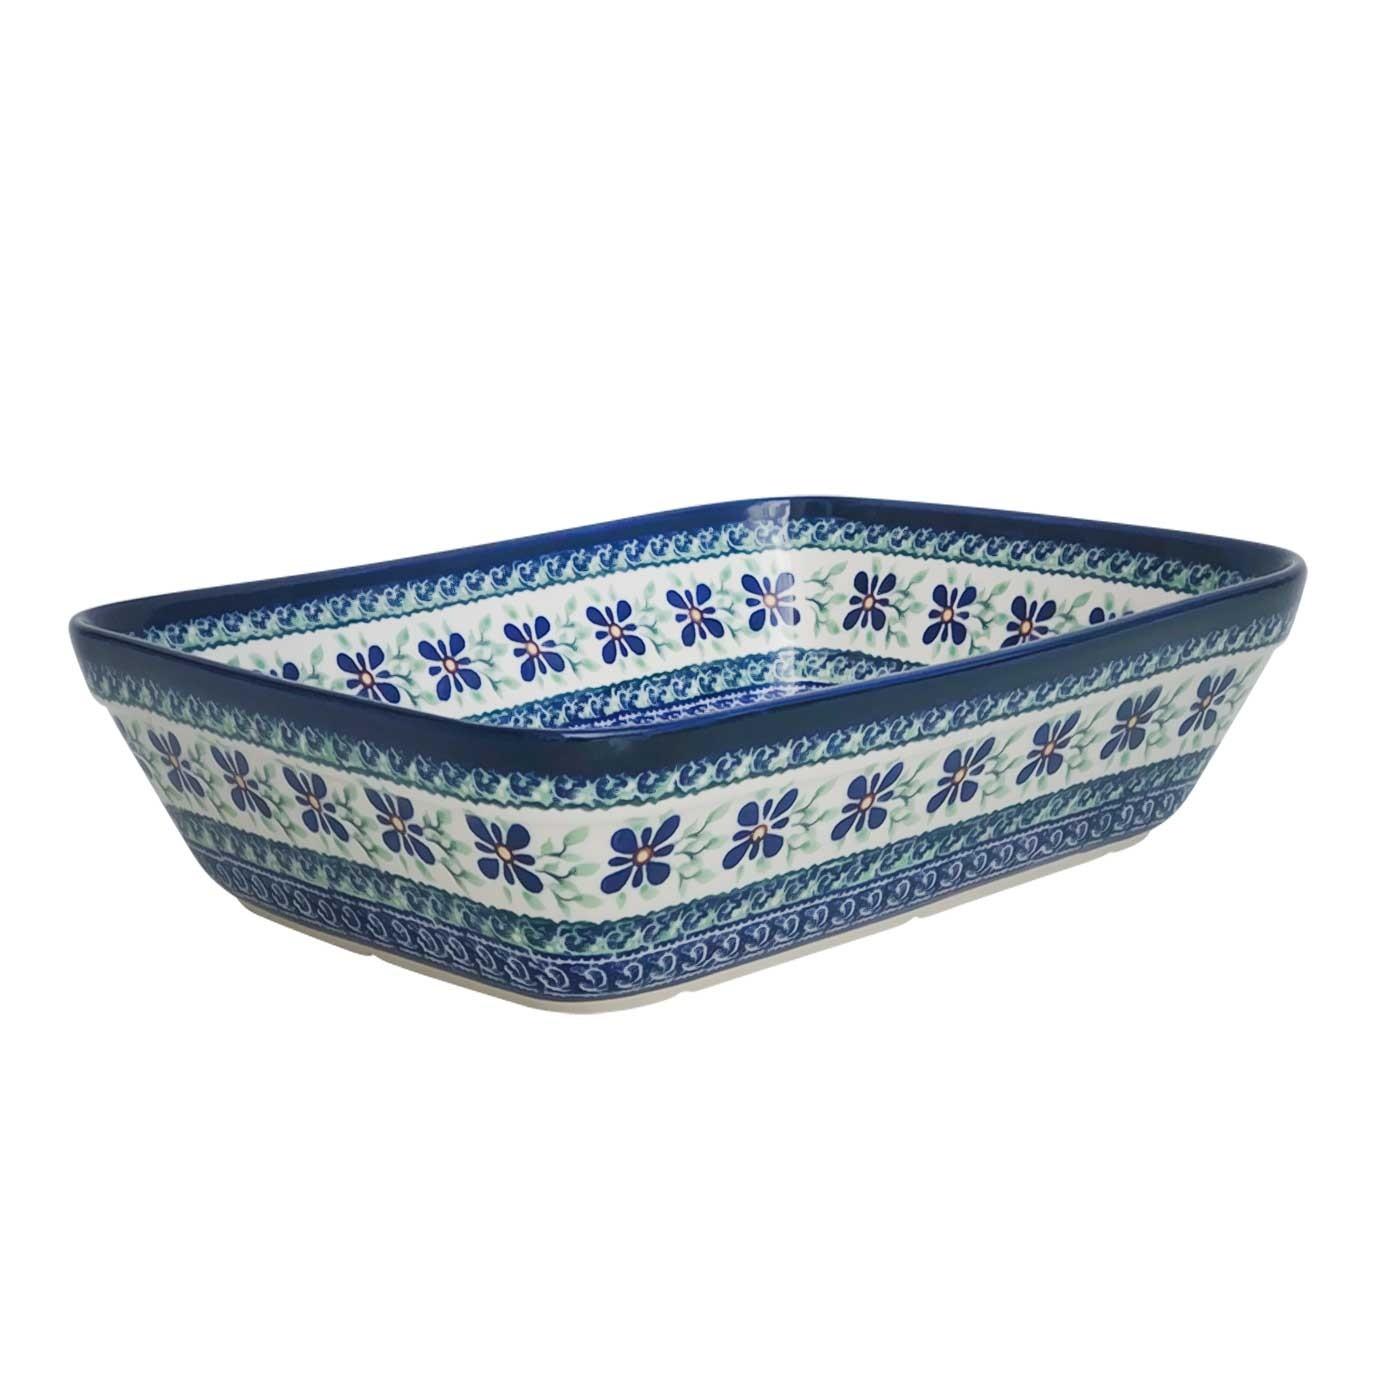 "Pottery Avenue 12"" Rectangle Stoneware Baker - 1351-DU121 Dearest Friend"